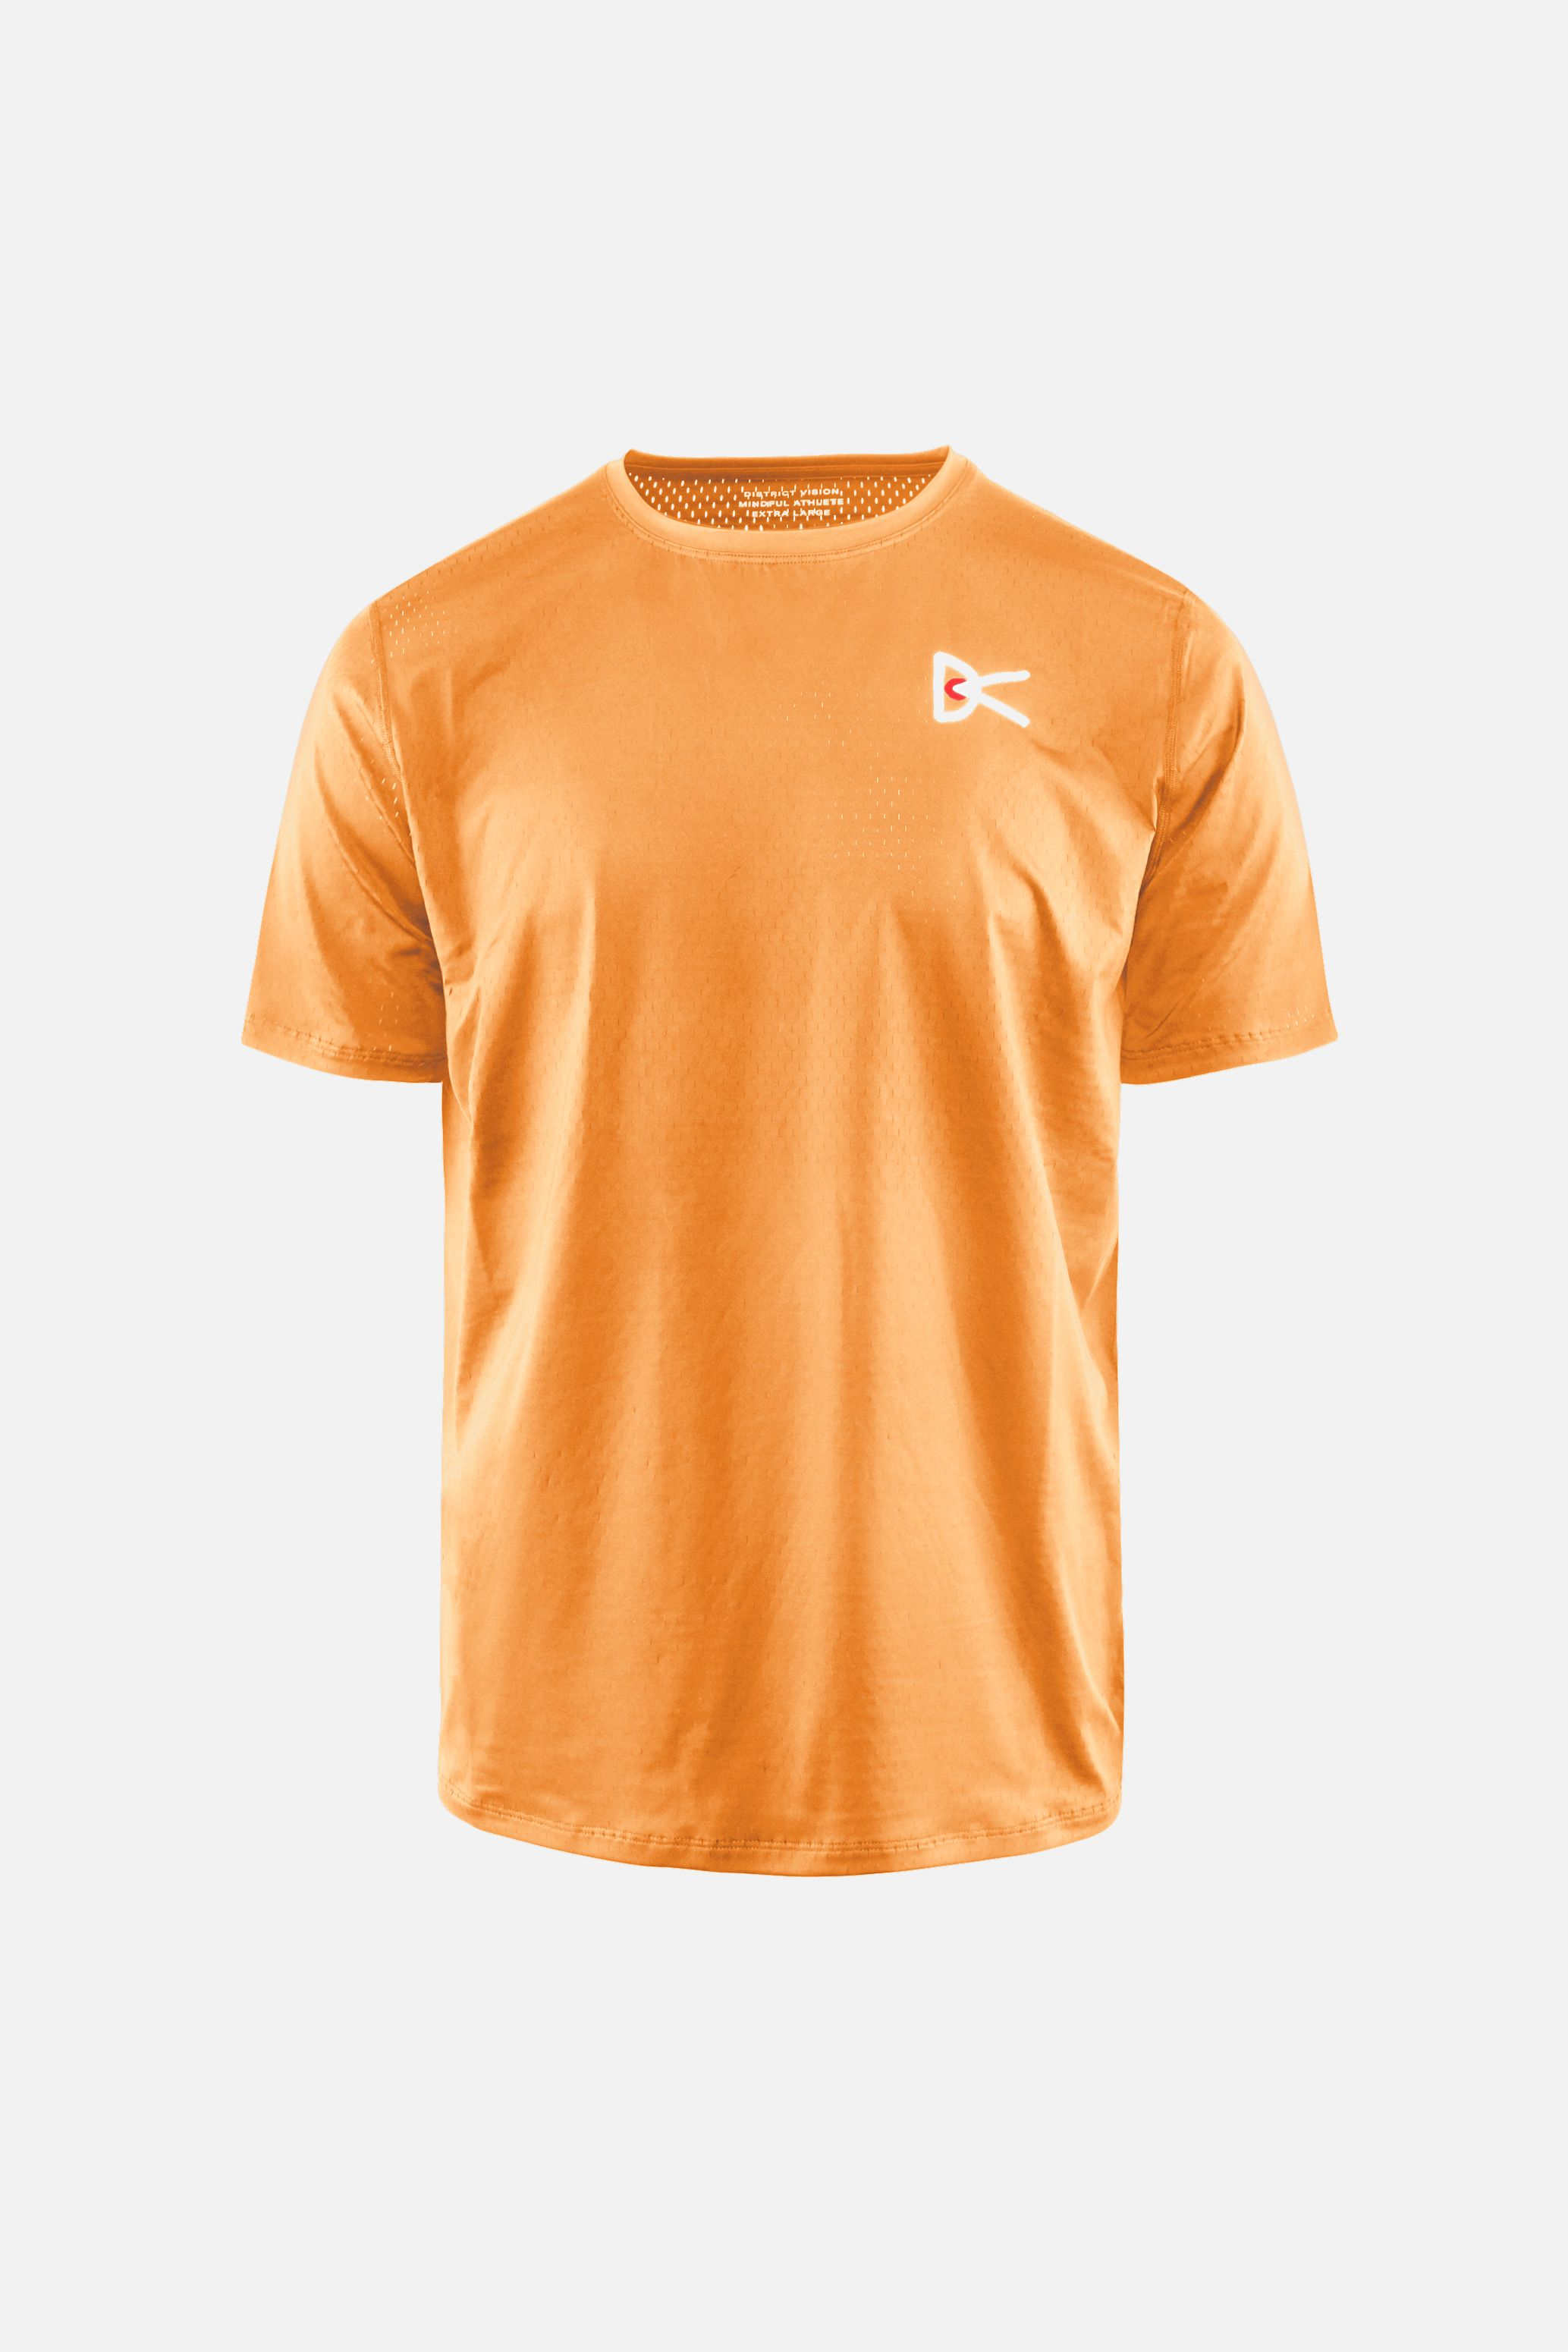 Air––Wear Short Sleeve T-Shirt, Burn